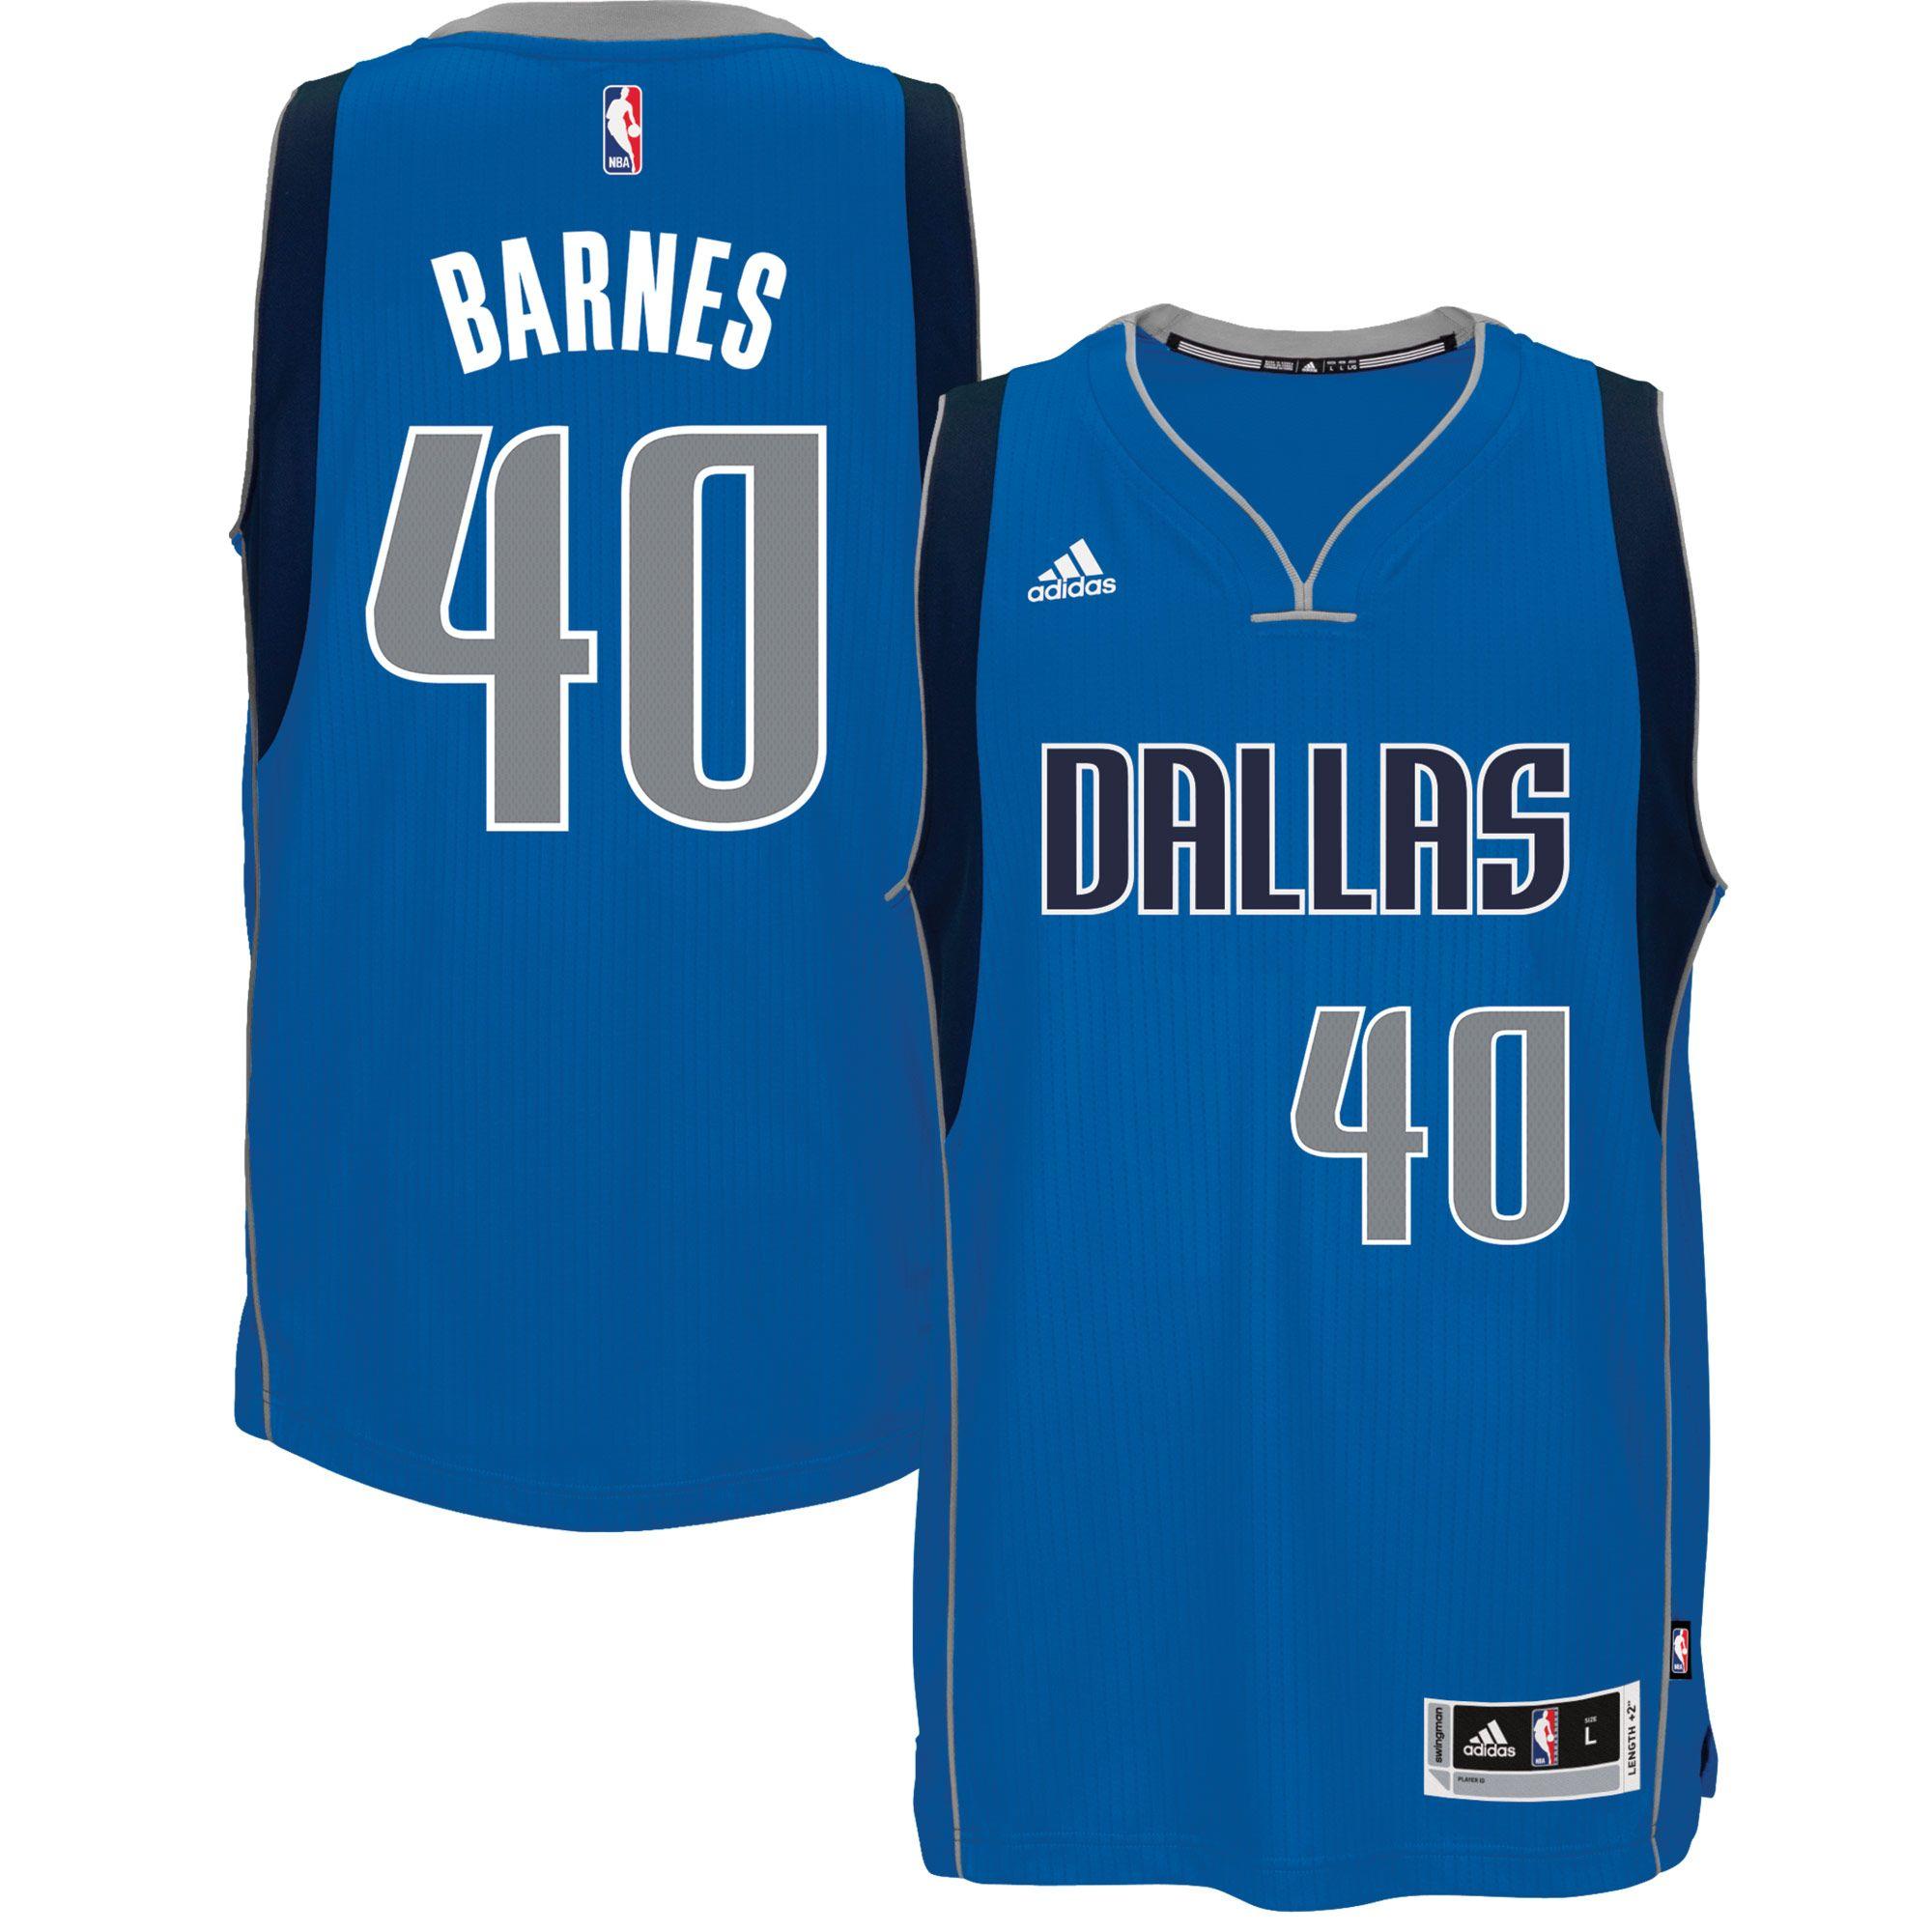 Harrison Barnes Dallas Mavericks adidas Road Swingman climacool Jersey -  Blue